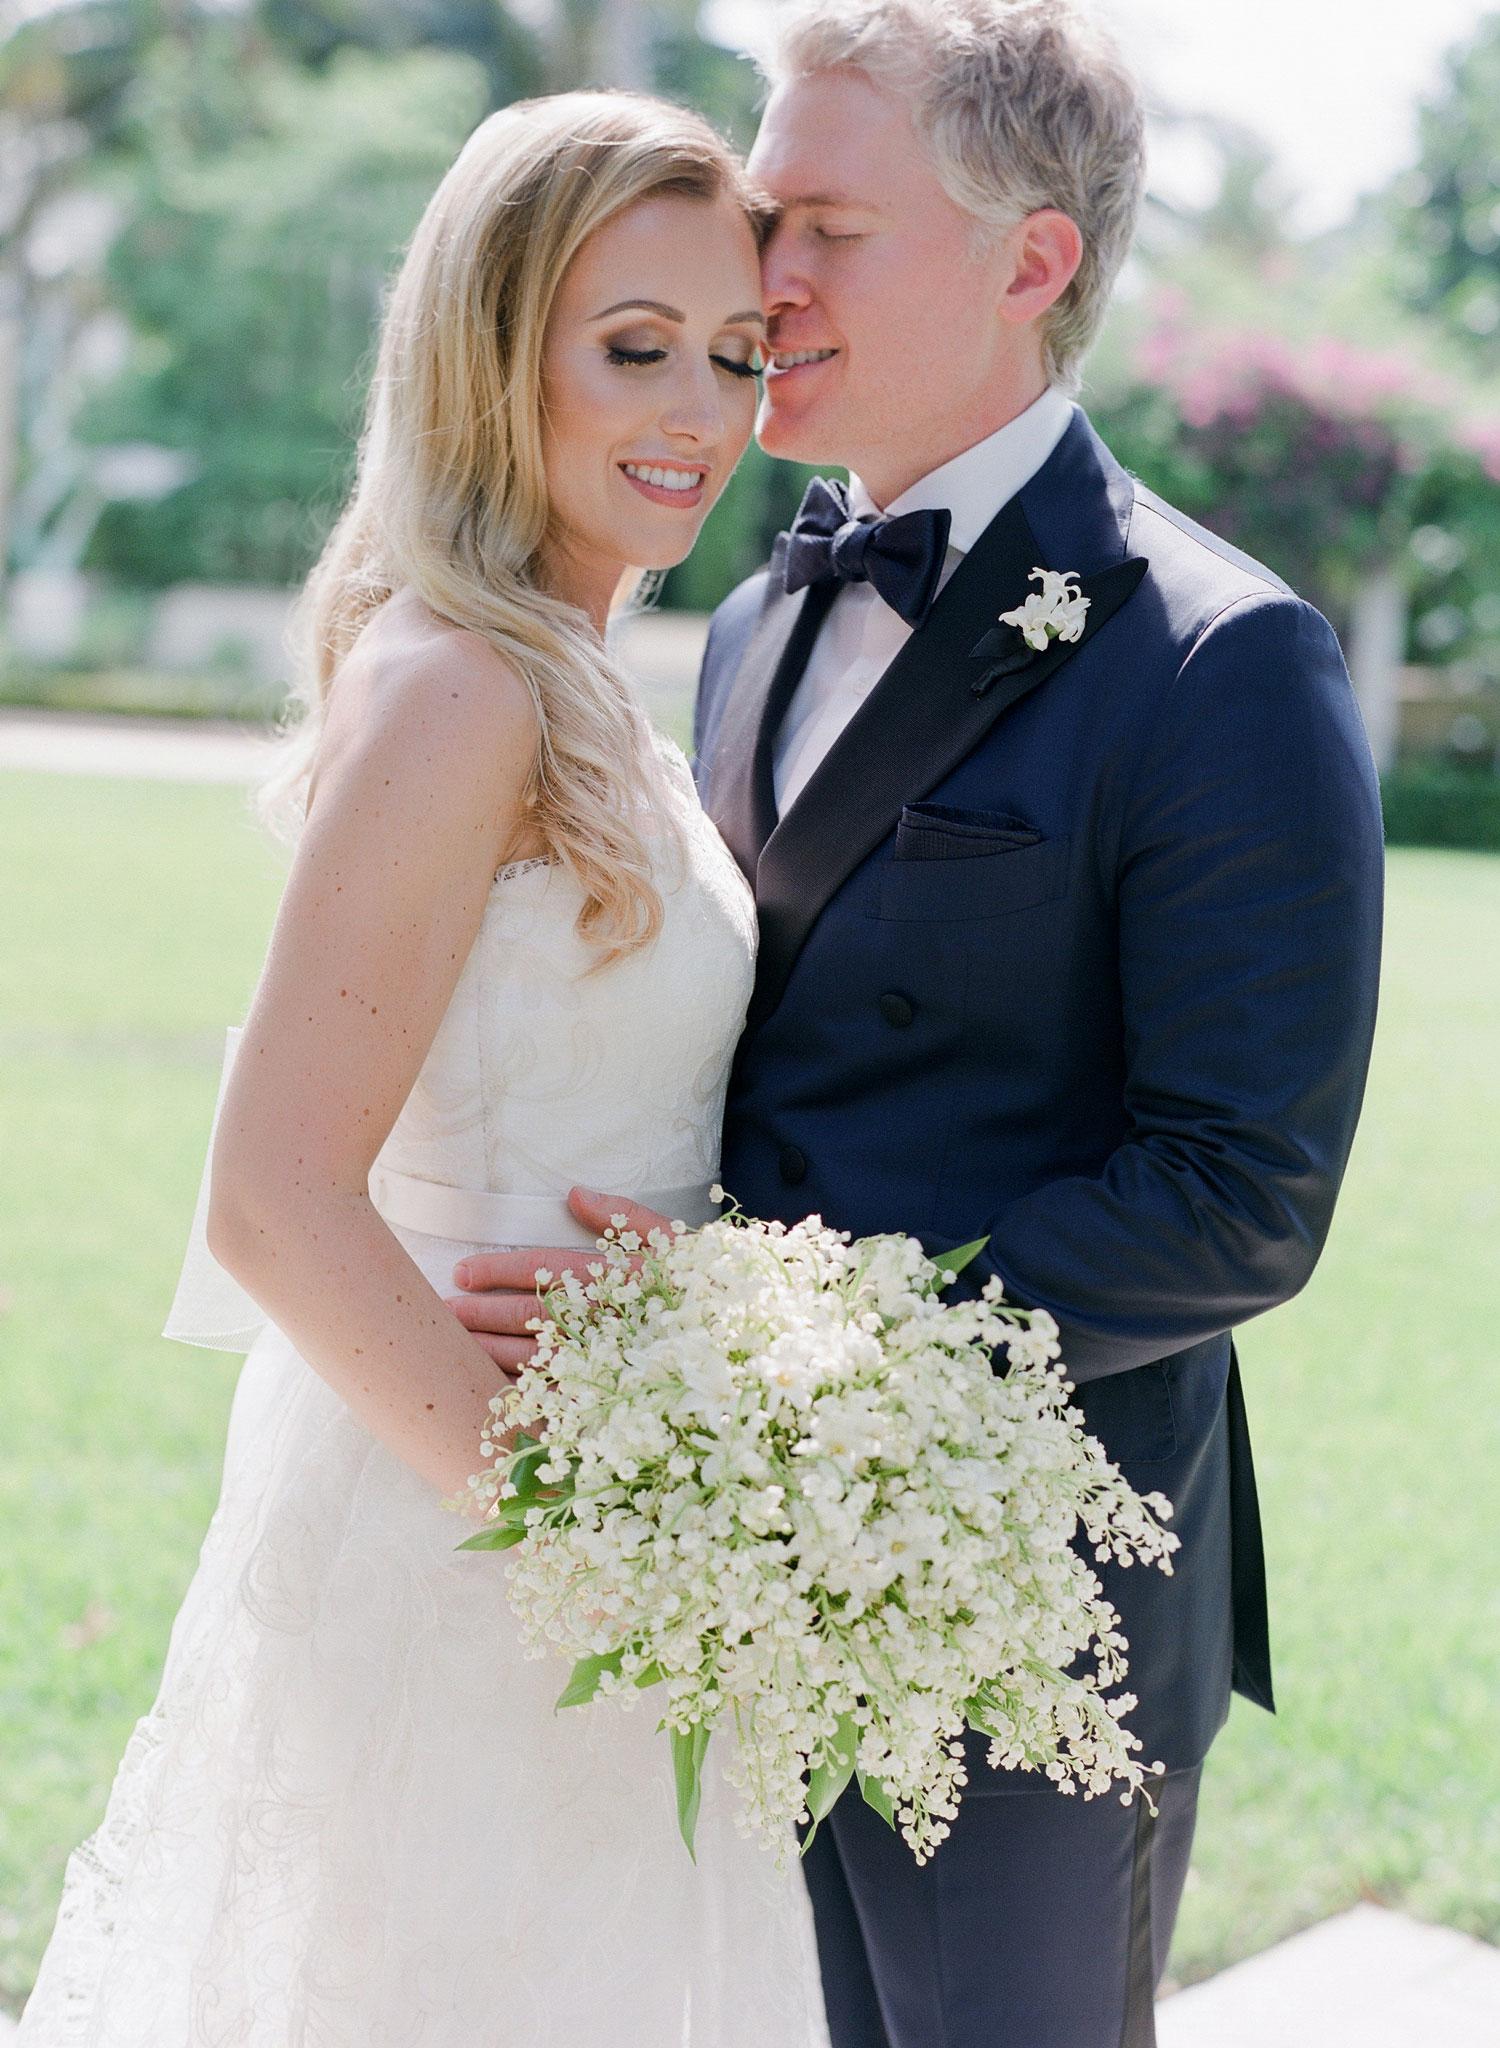 wedding photo portrait of bride and groom classic wedding palm beach